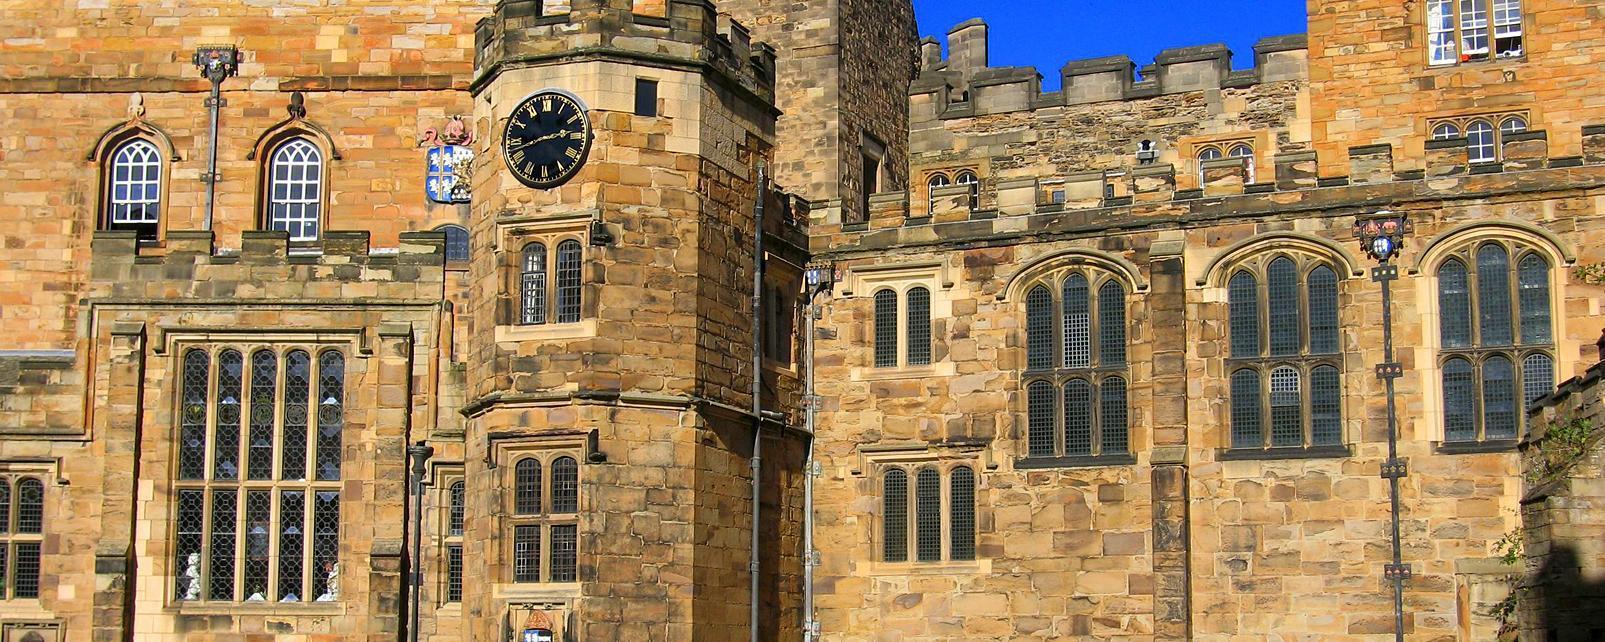 Durham United Kingdom  City pictures : Weather forecast Durham, United Kingdom Best time to go Easyvoyage